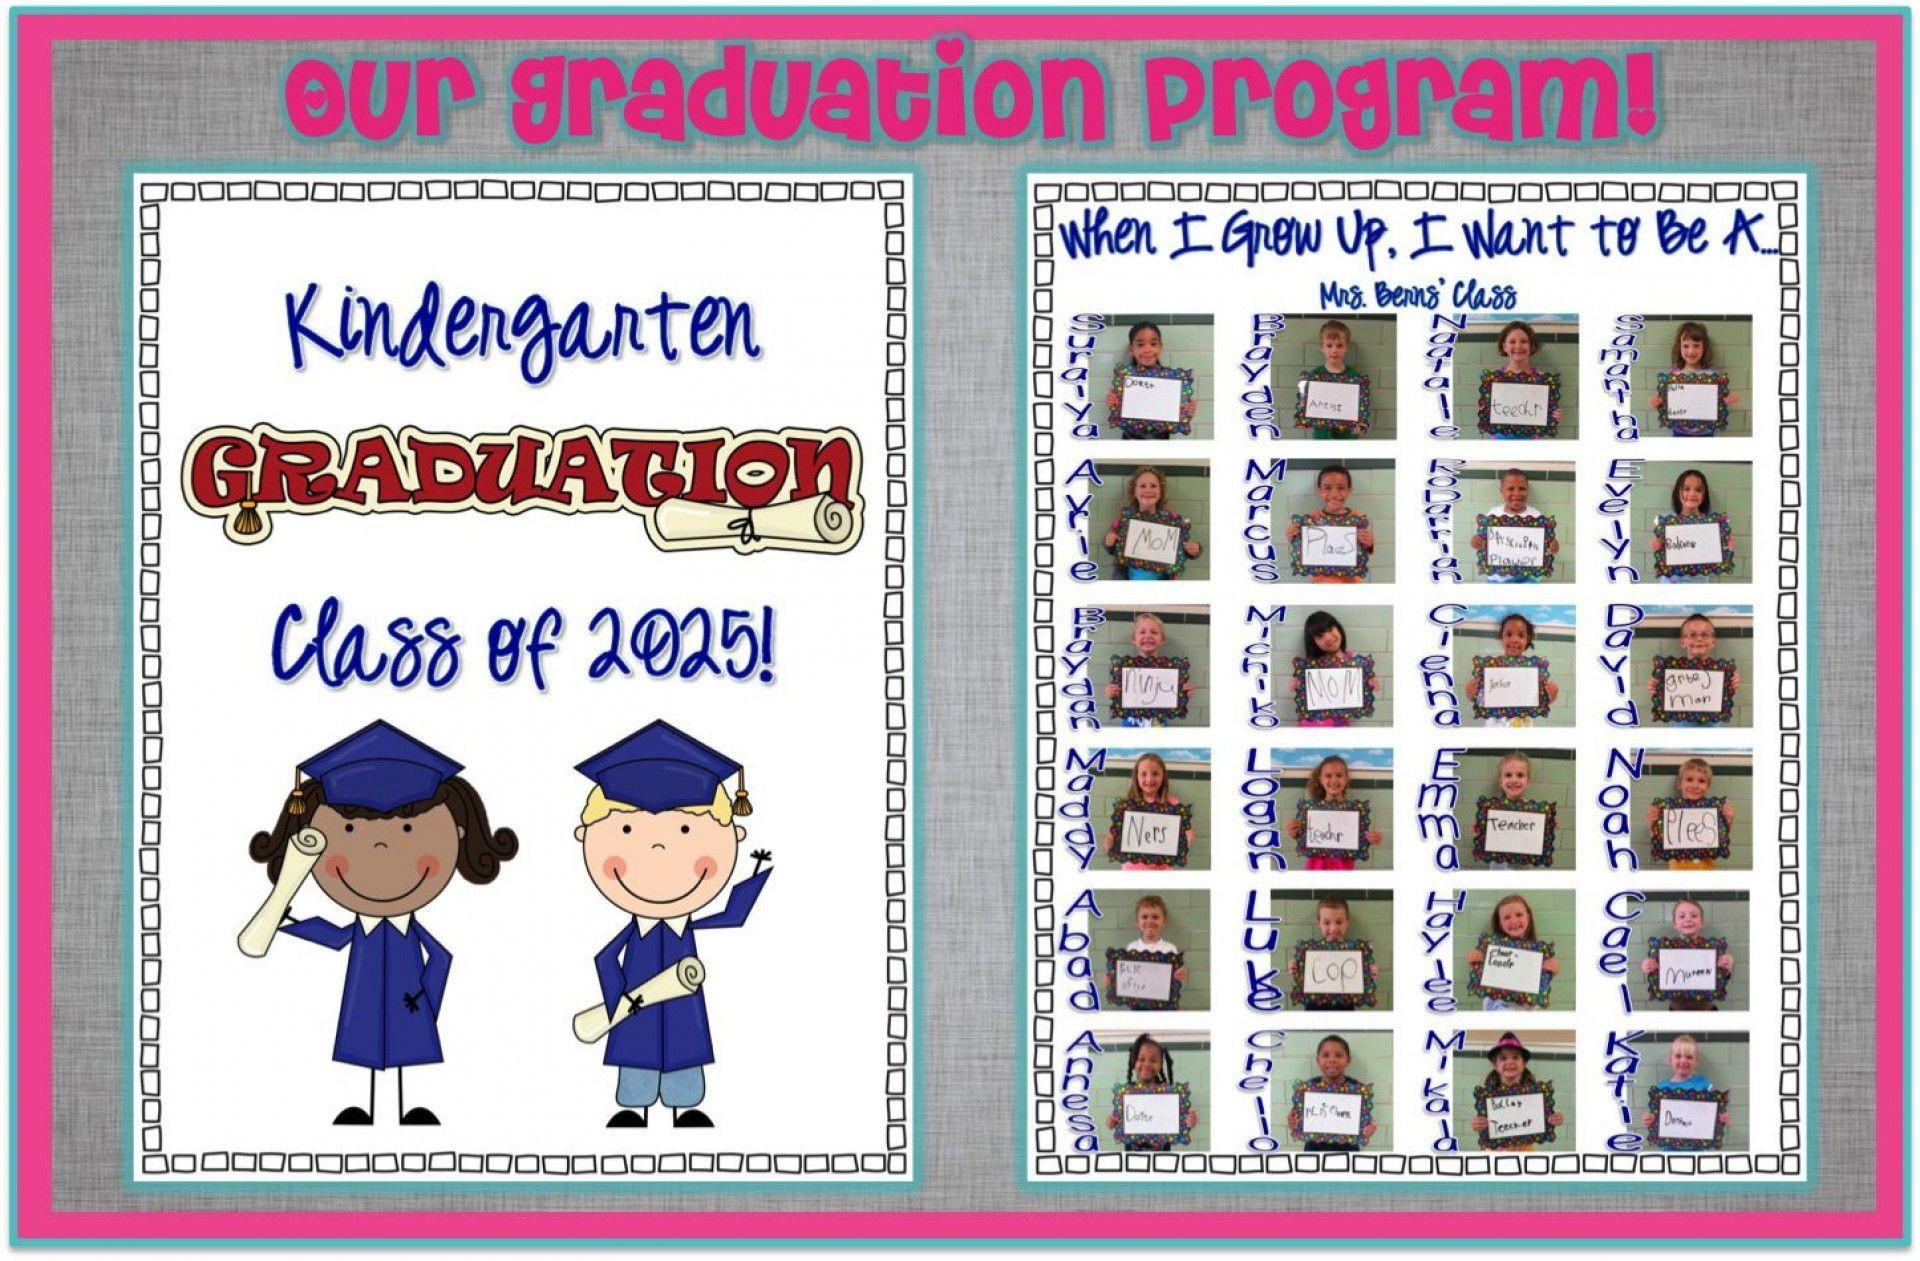 000 Unbelievable Preschool Graduation Program Template Concept  Templates Free Printable Pdf1920